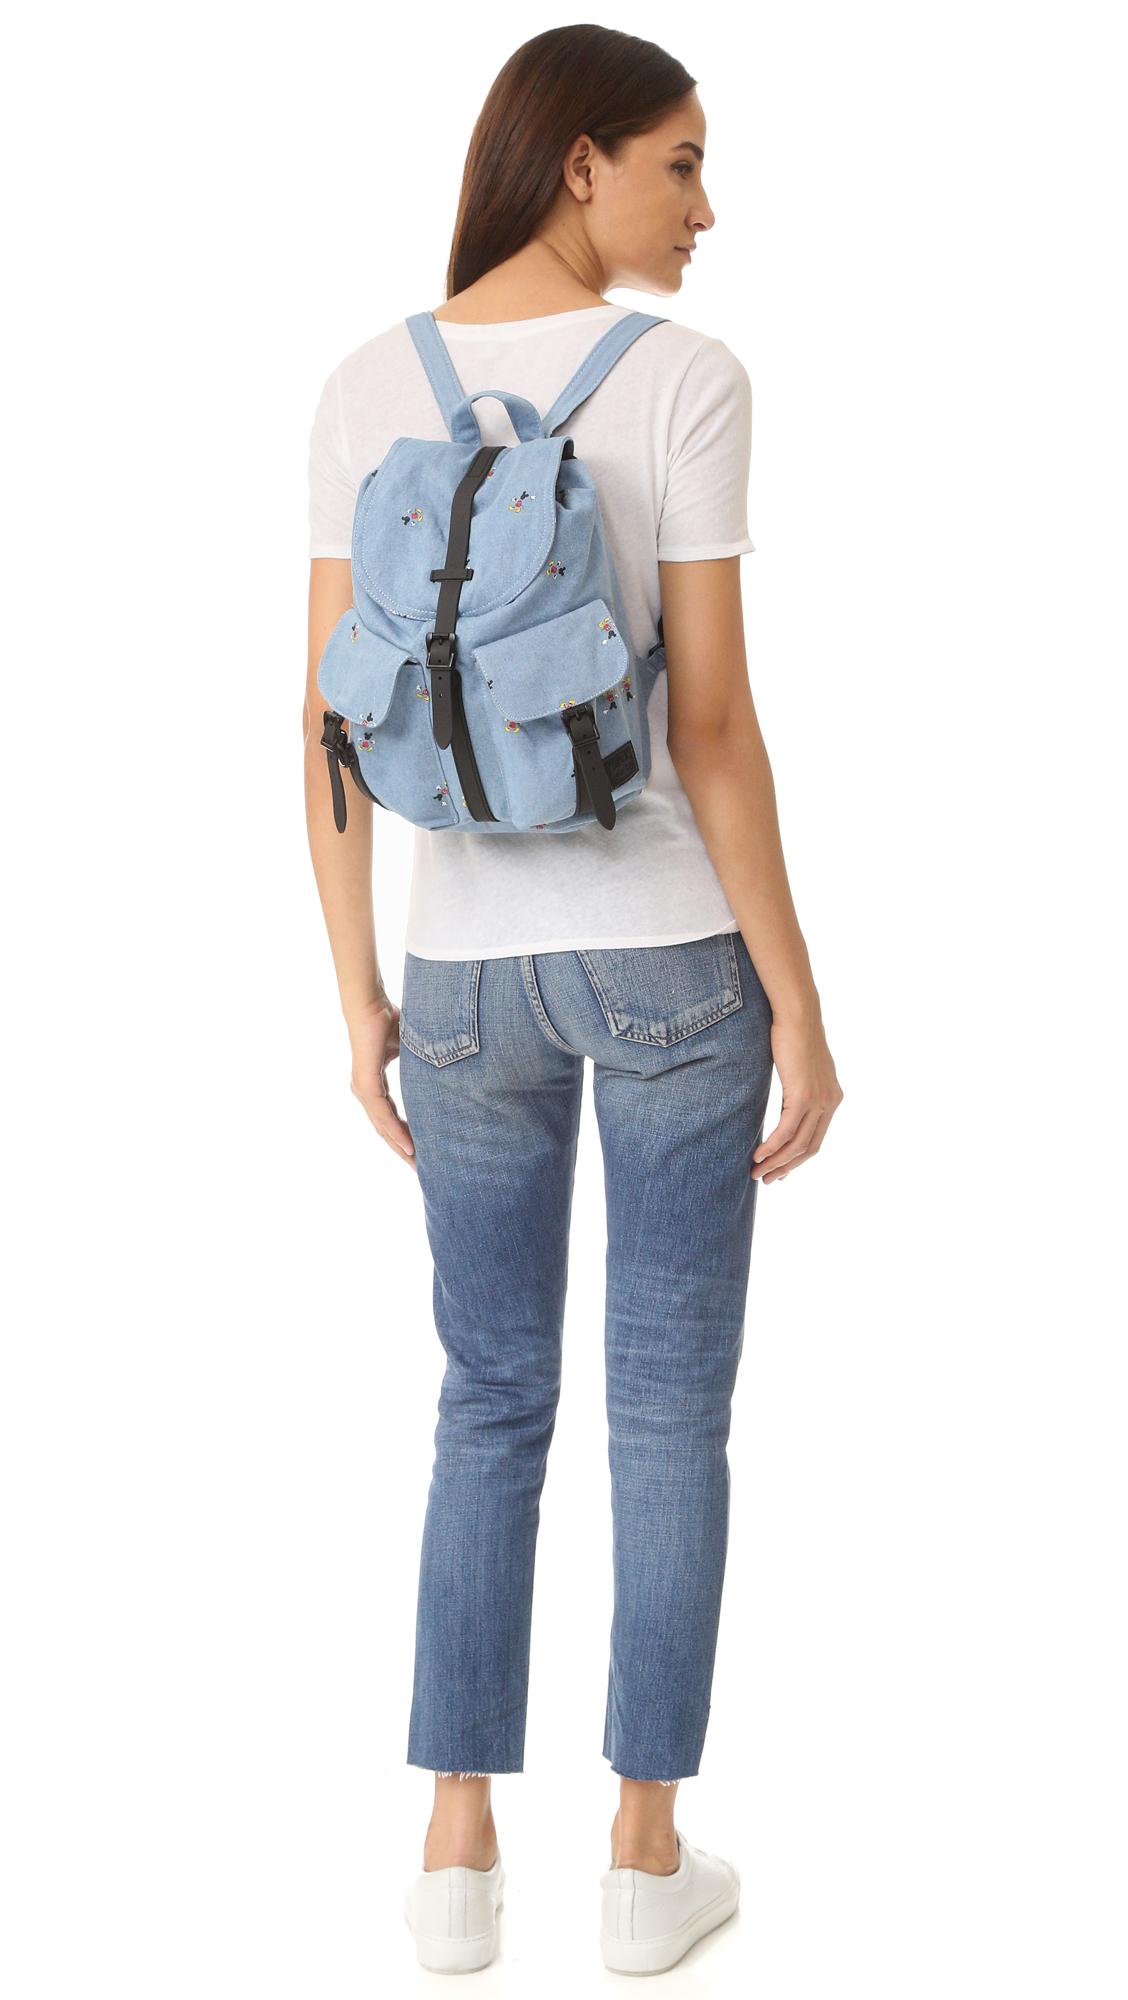 321f3b29d8c Lyst - Herschel Supply Co. Disney Dawson Backpack in Blue